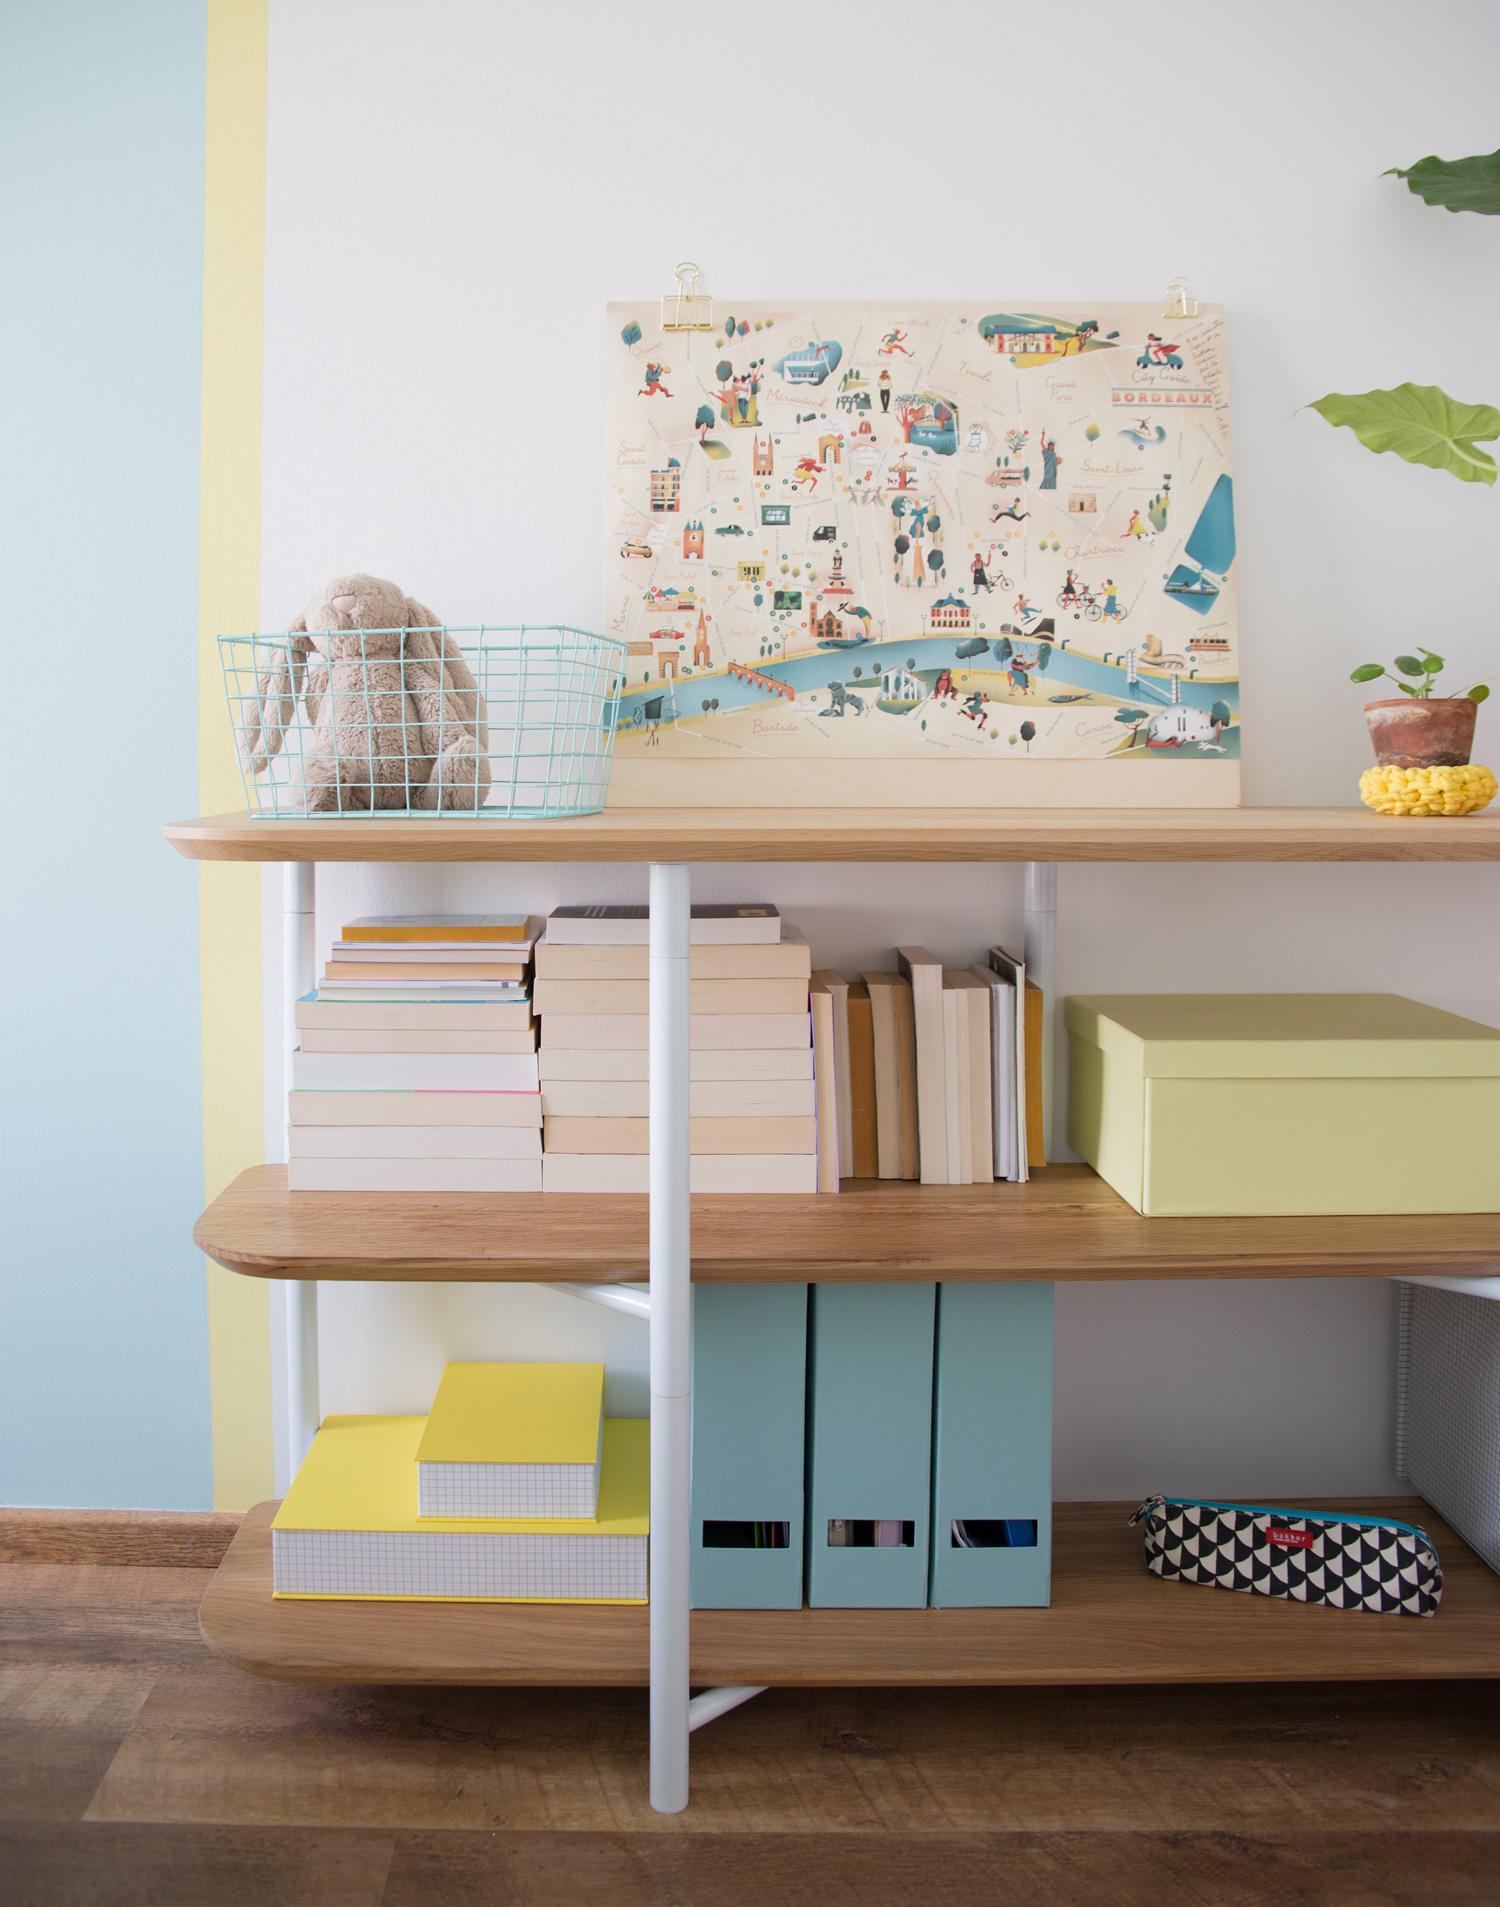 la chambre d 39 ados graphique de jade la fille de miss etc. Black Bedroom Furniture Sets. Home Design Ideas